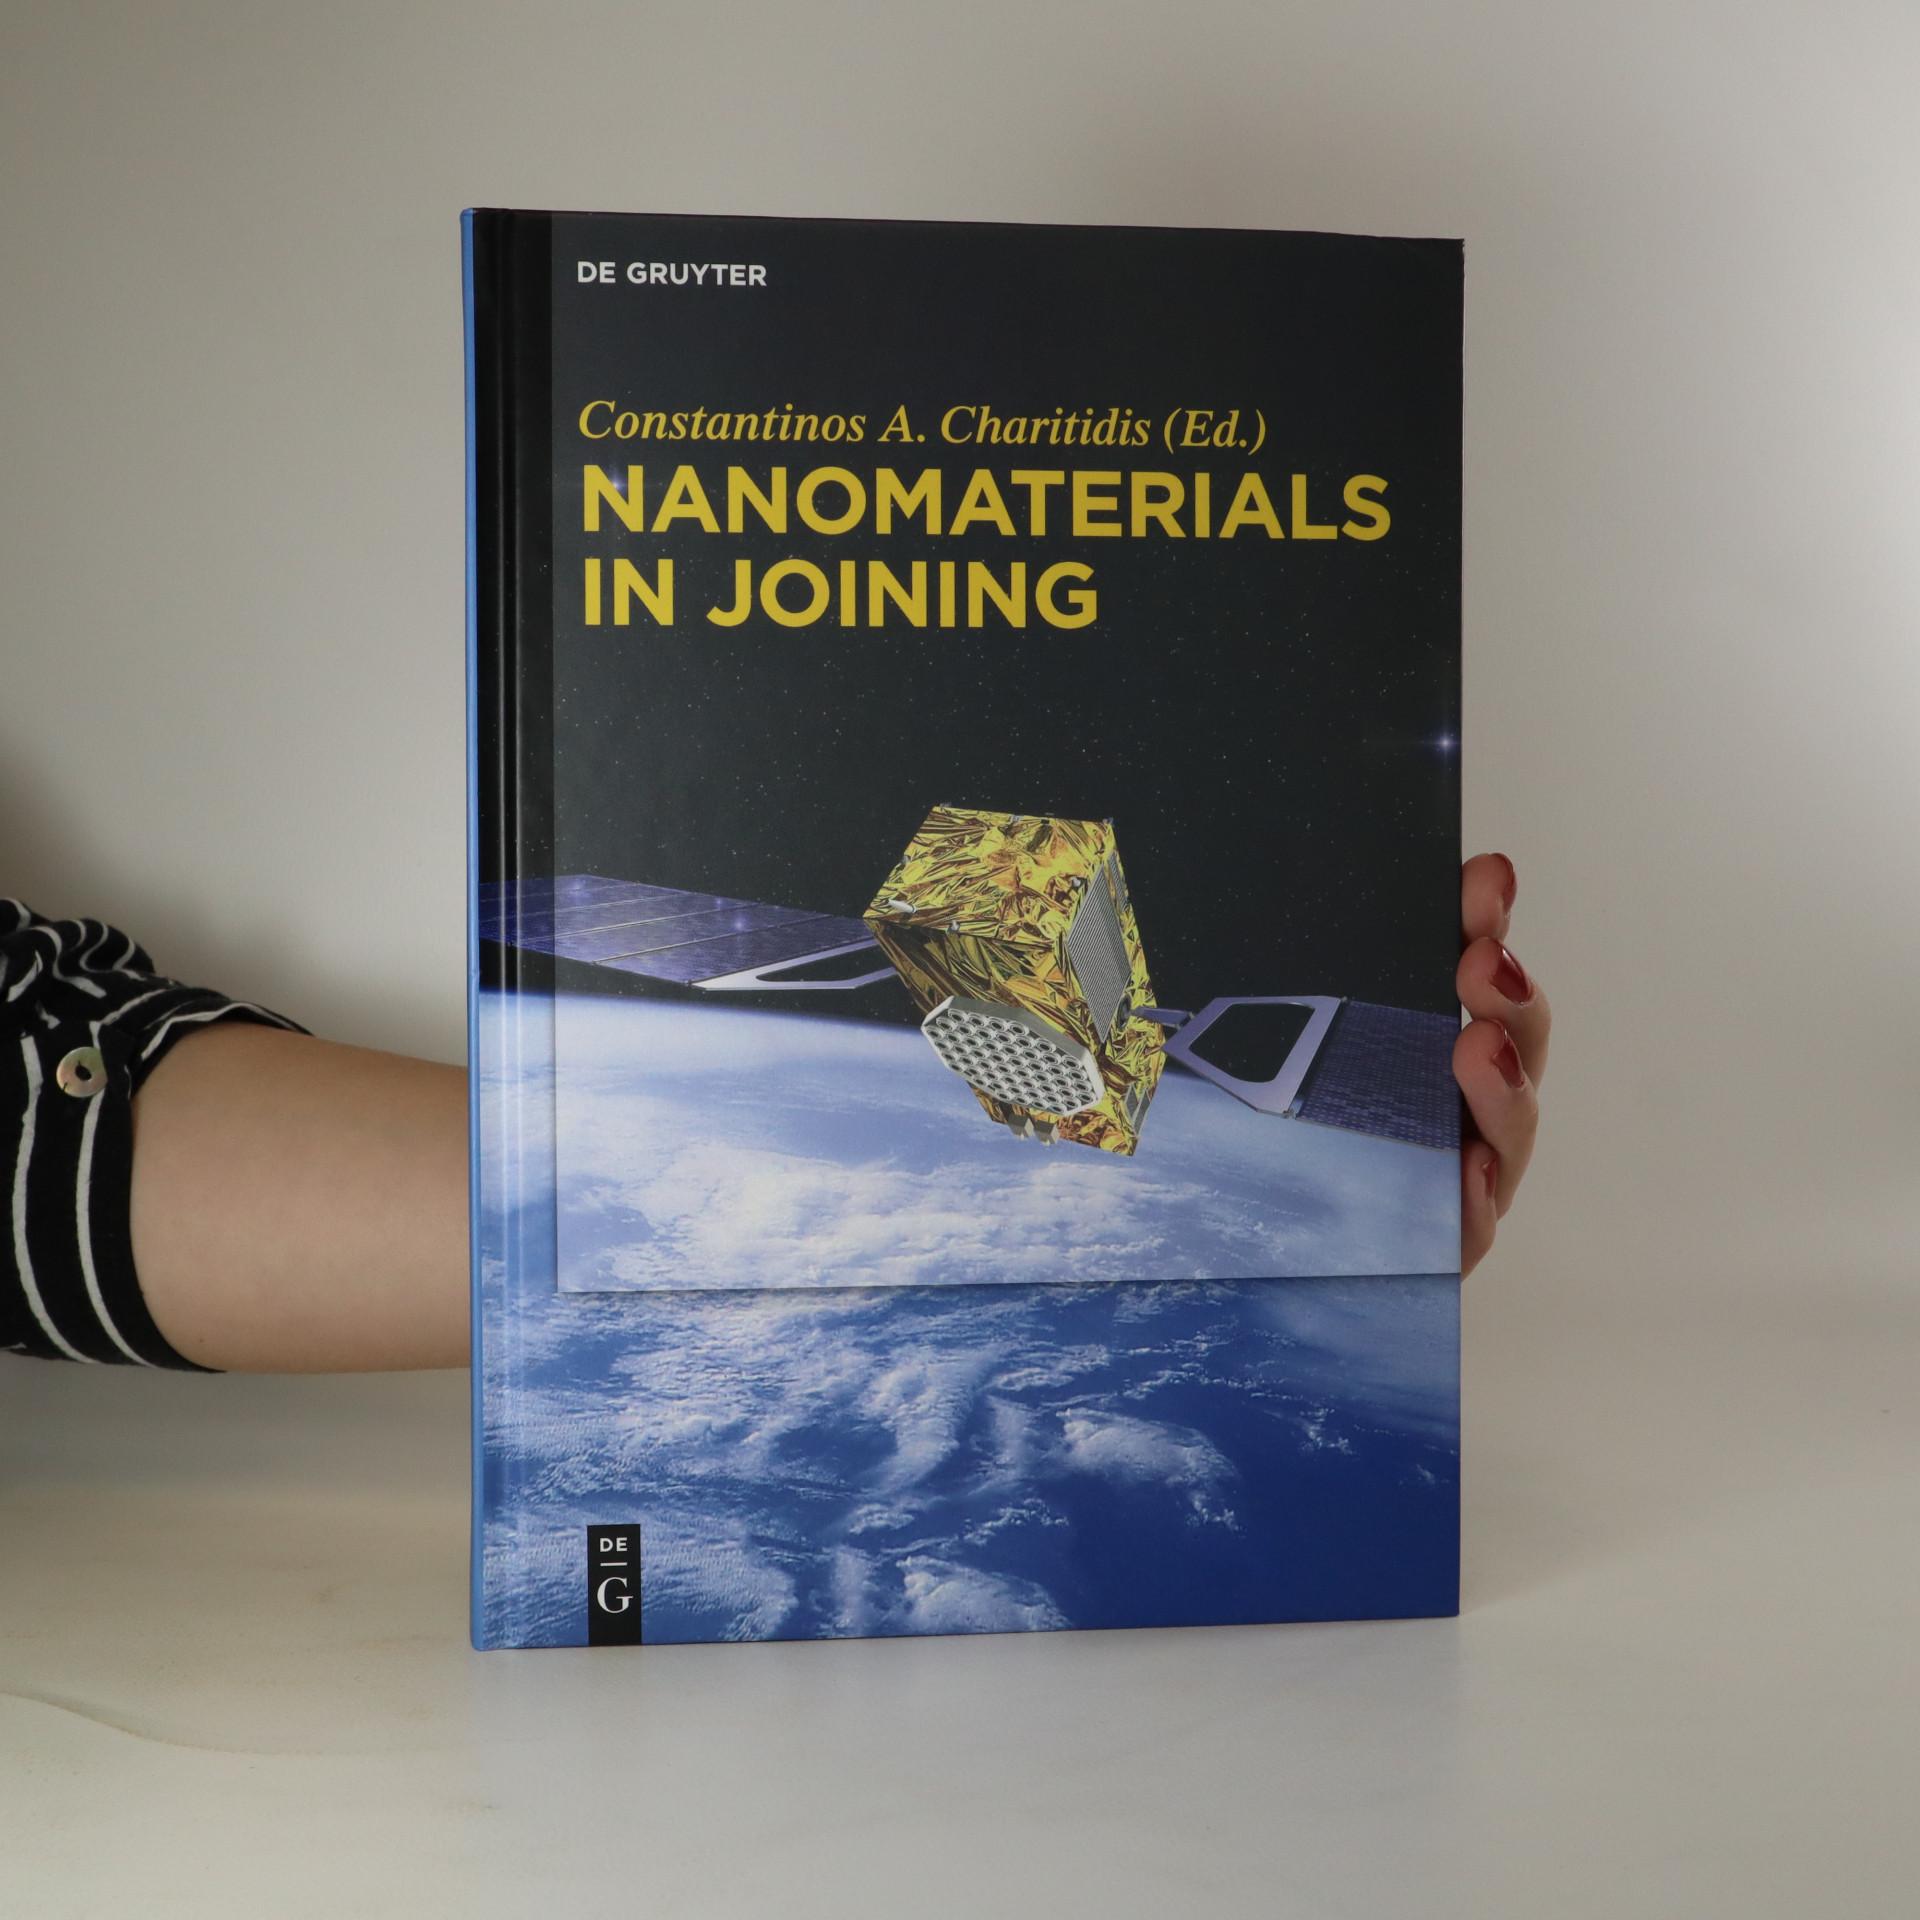 antikvární kniha Nanomaterials in joining, 2016